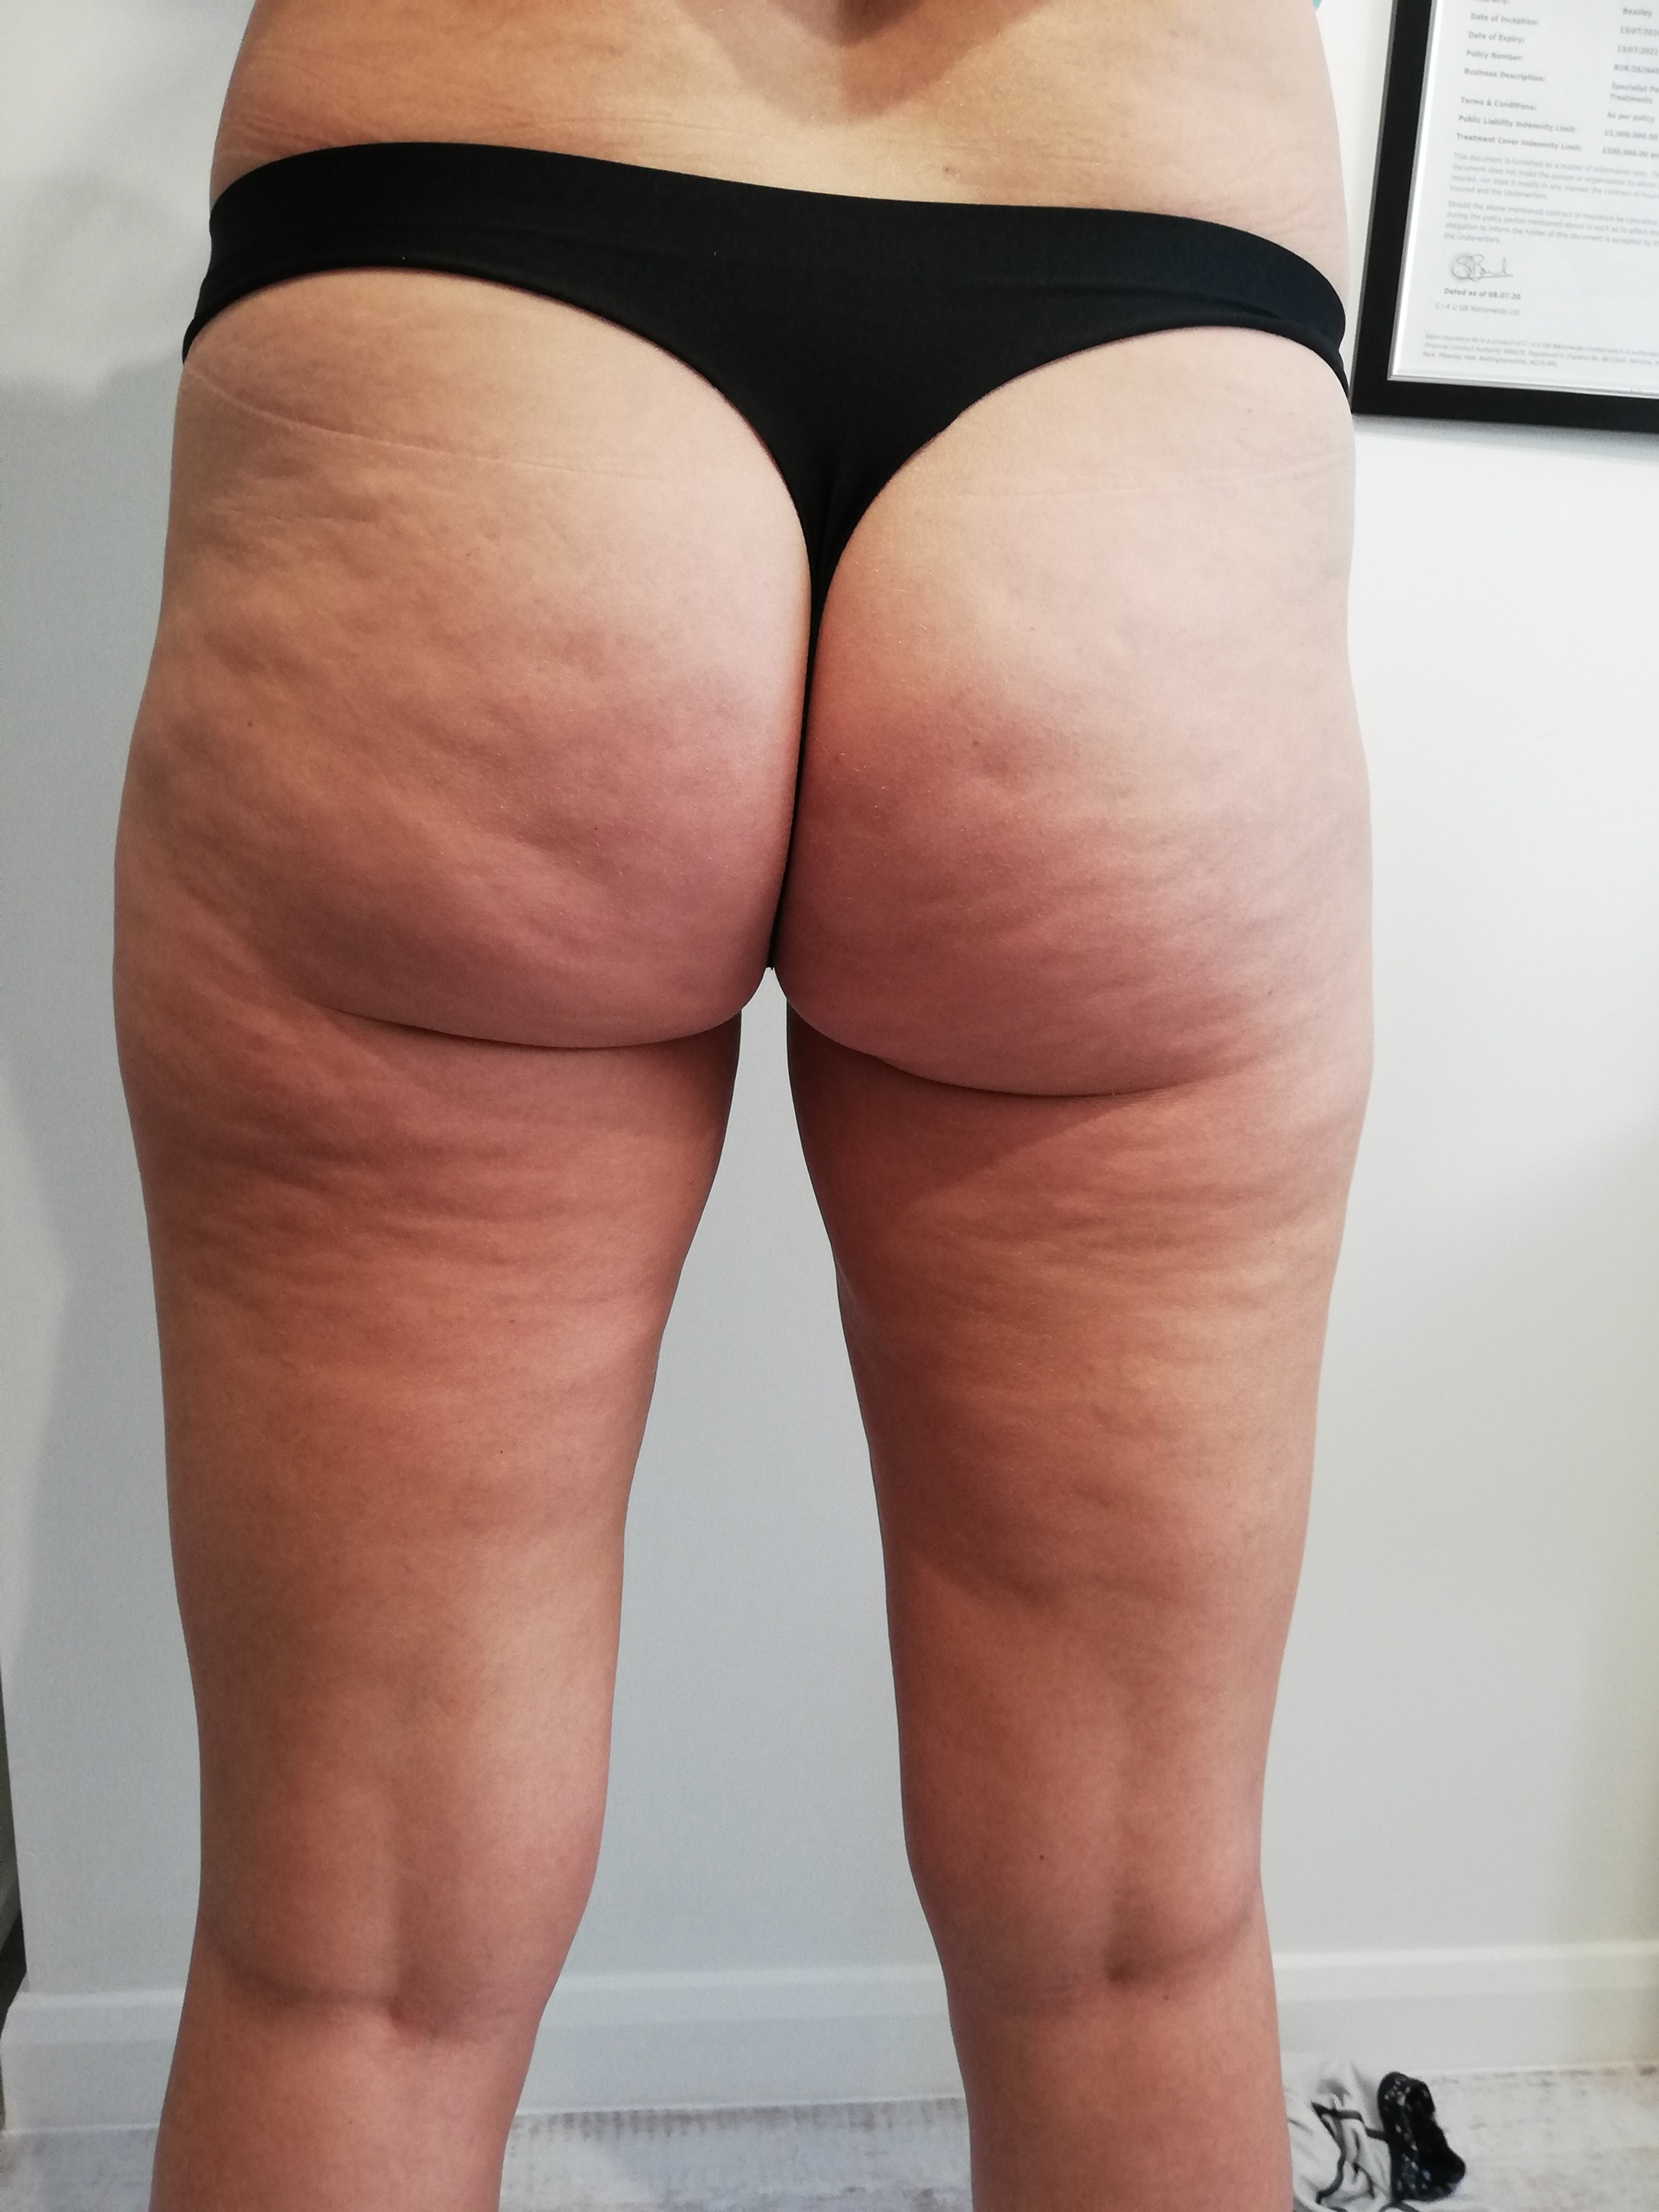 Cellulite reduction treatment plan